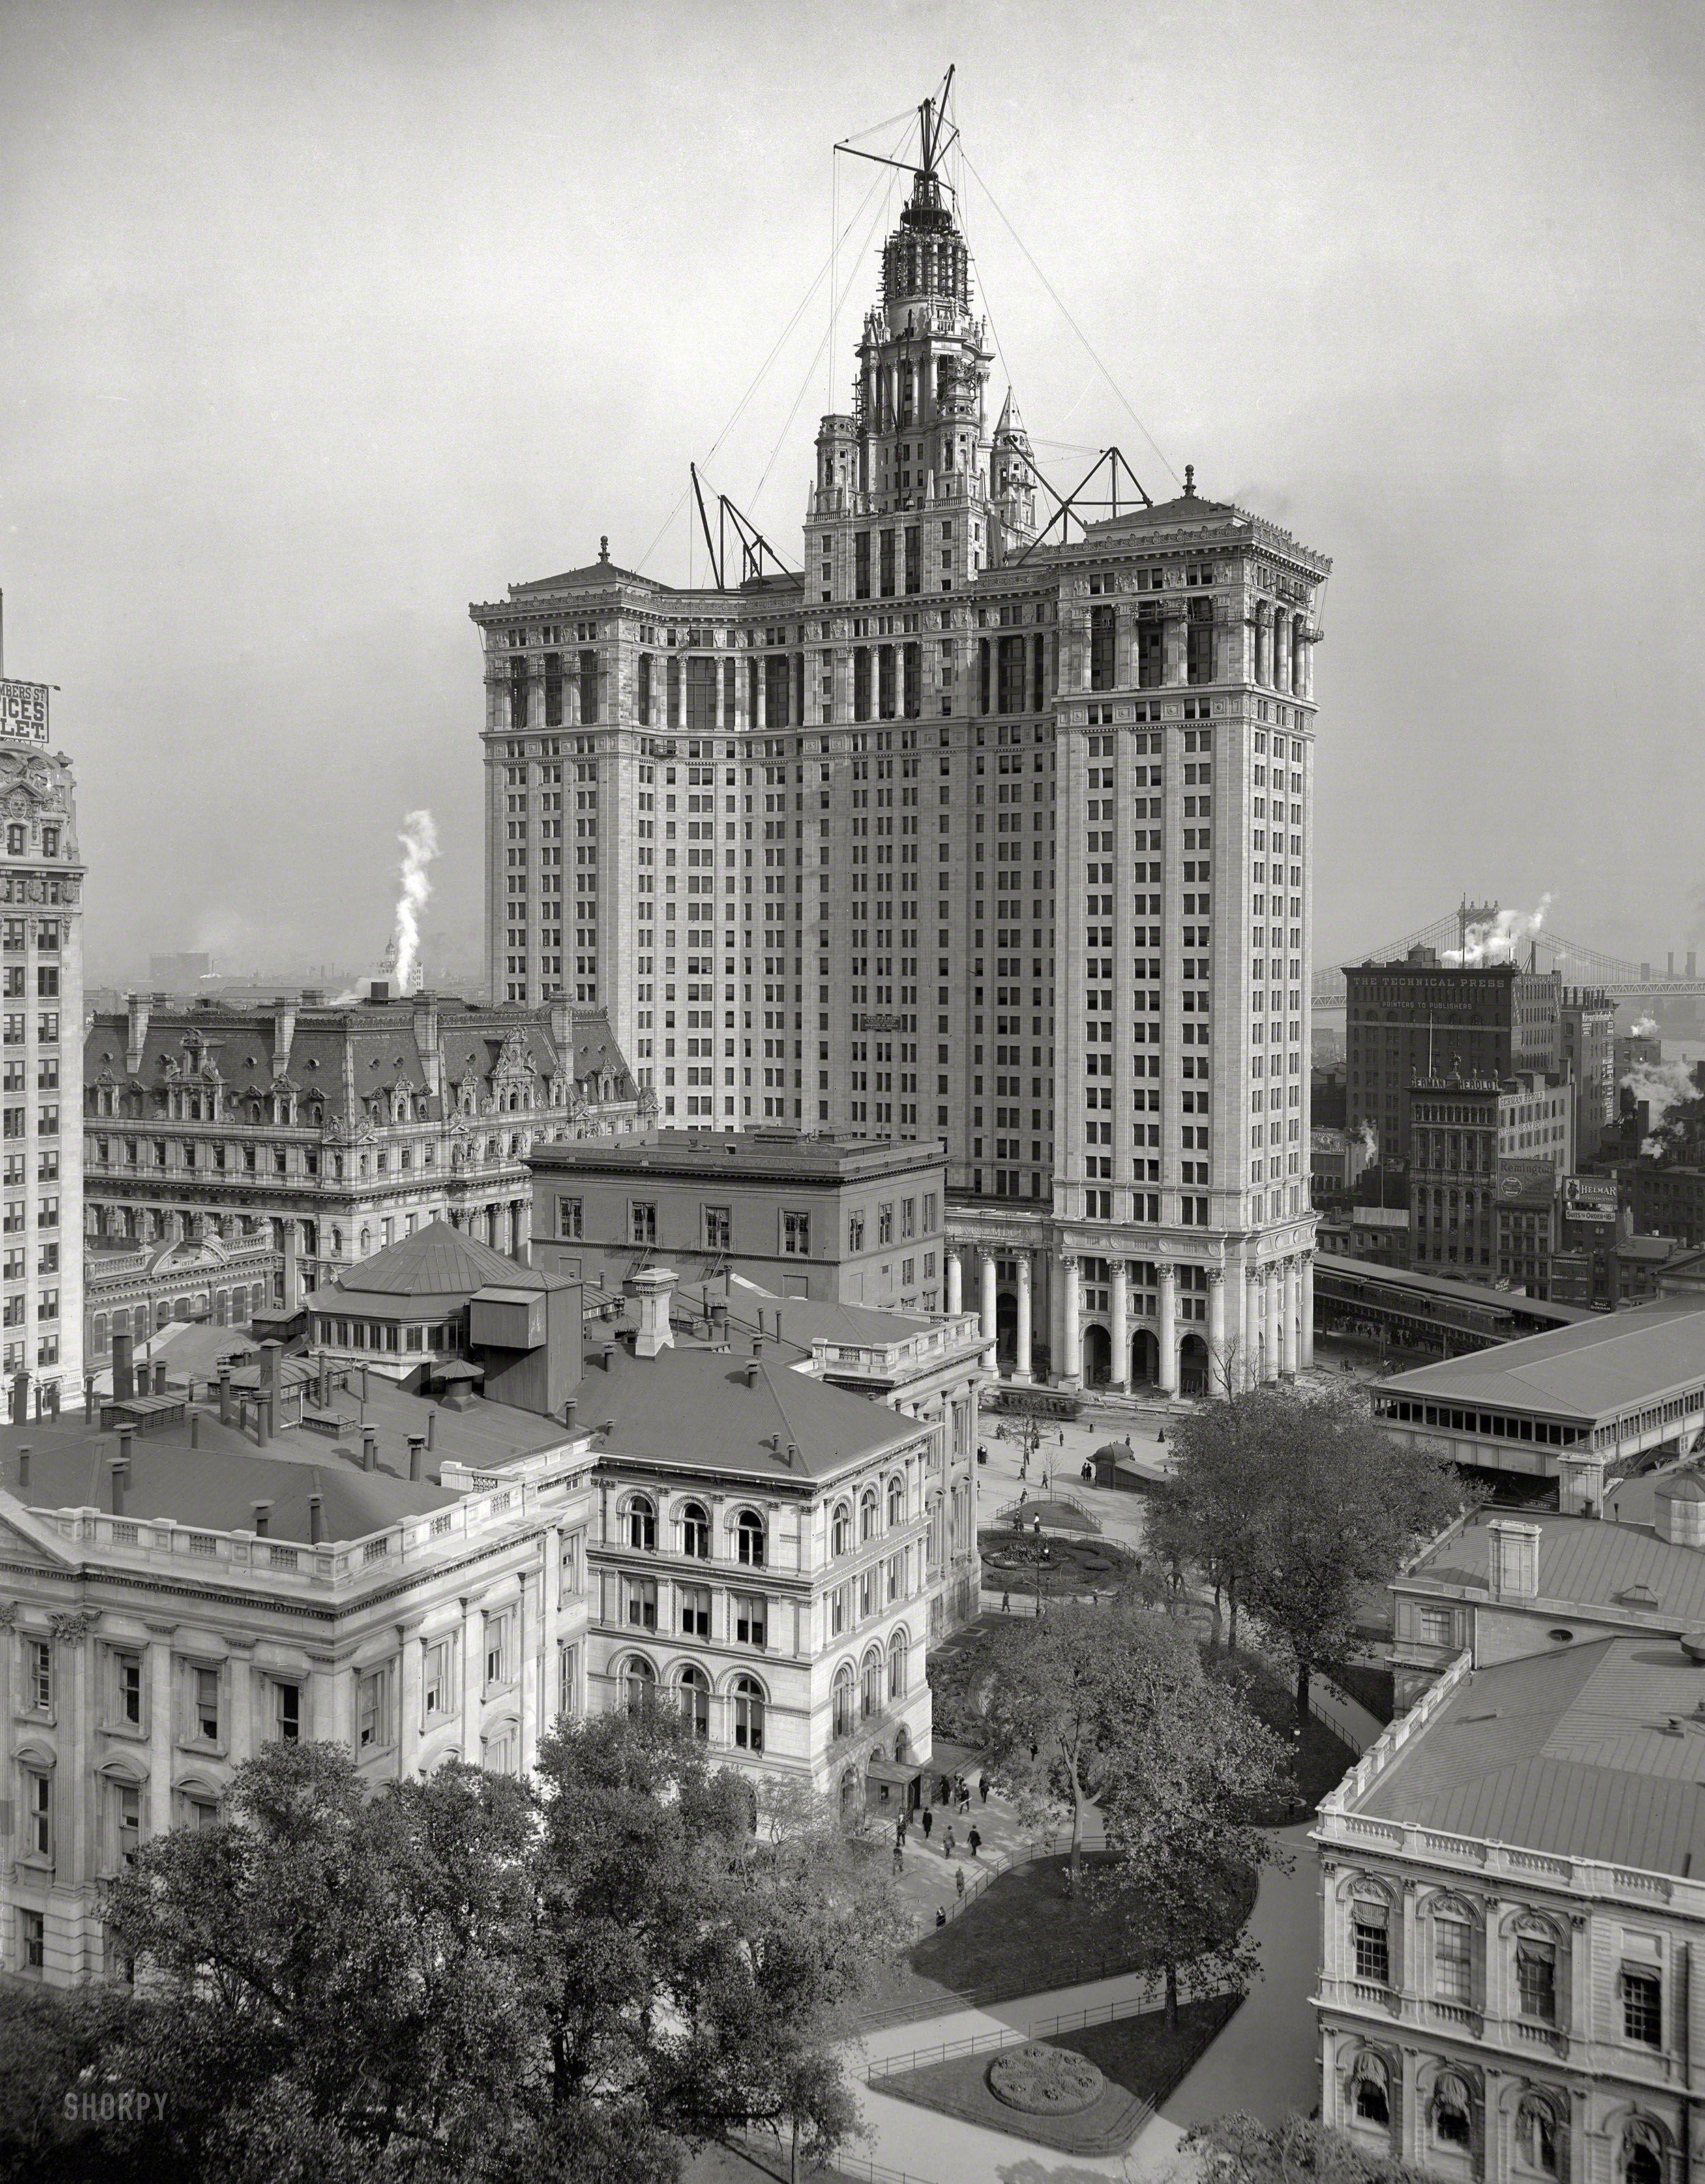 Circa 1913 New Municipal Building New York City The 40 Story